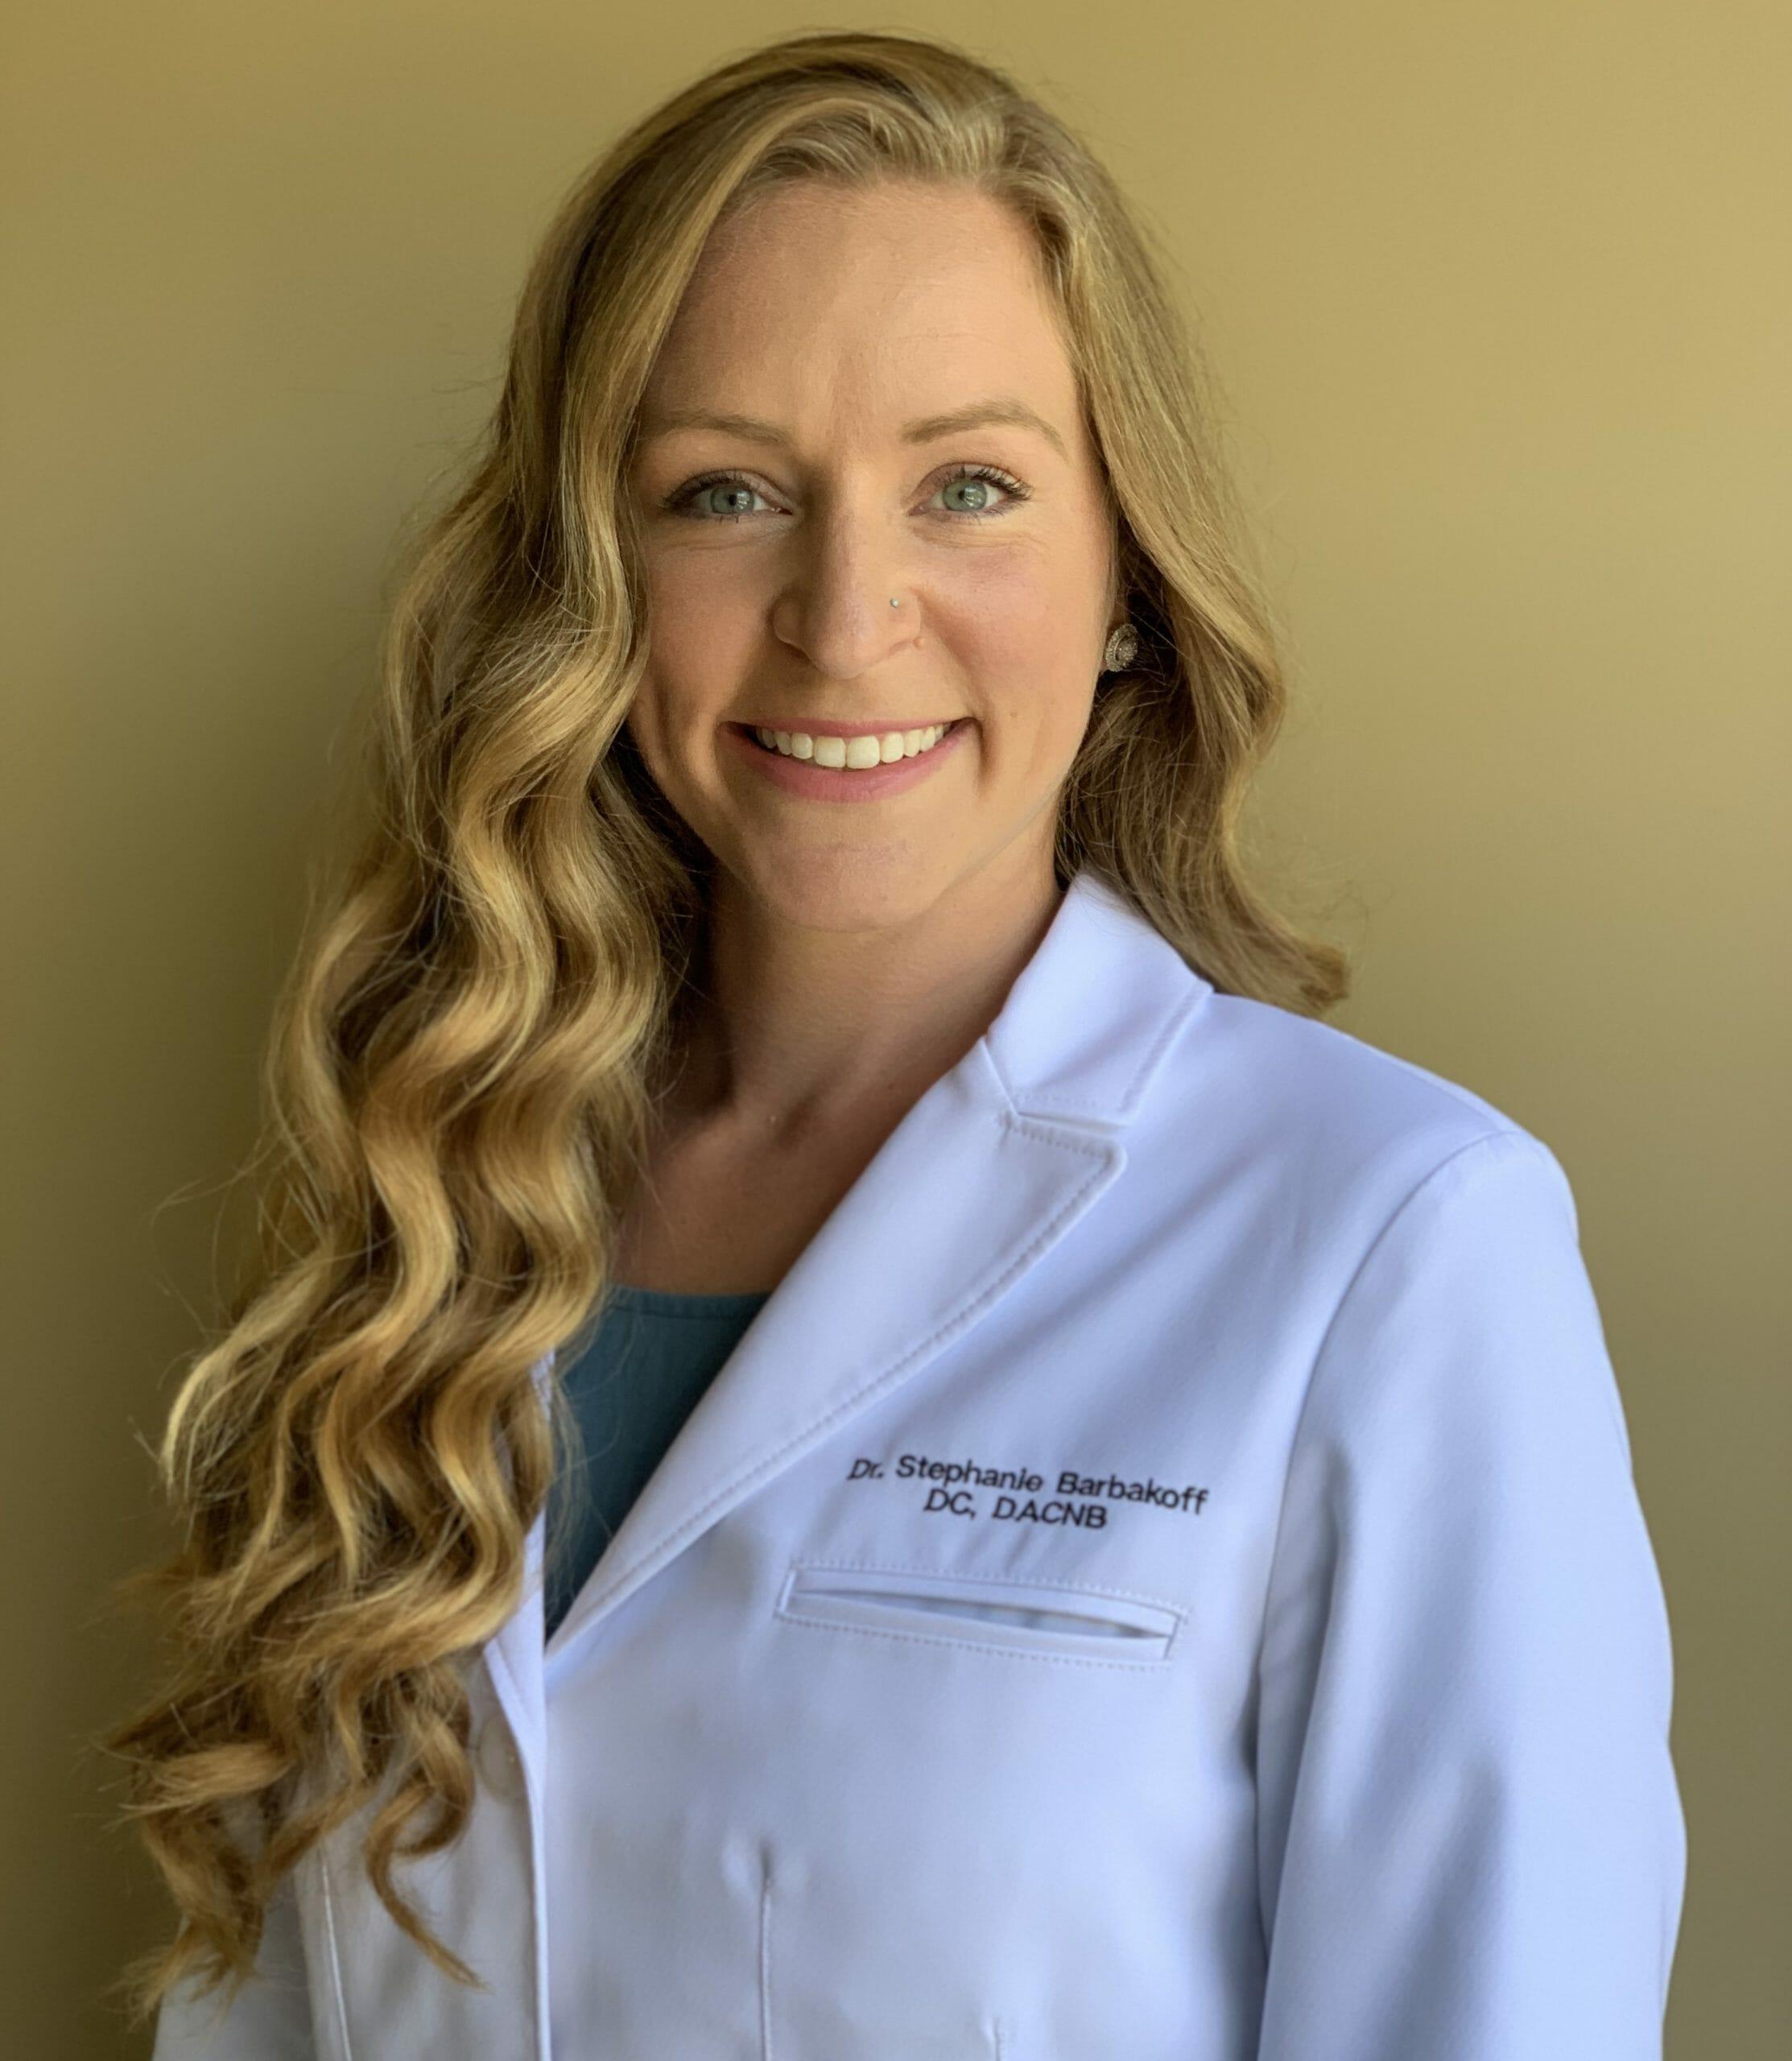 Dr. Stephanie Barbakoff DC, DACNB